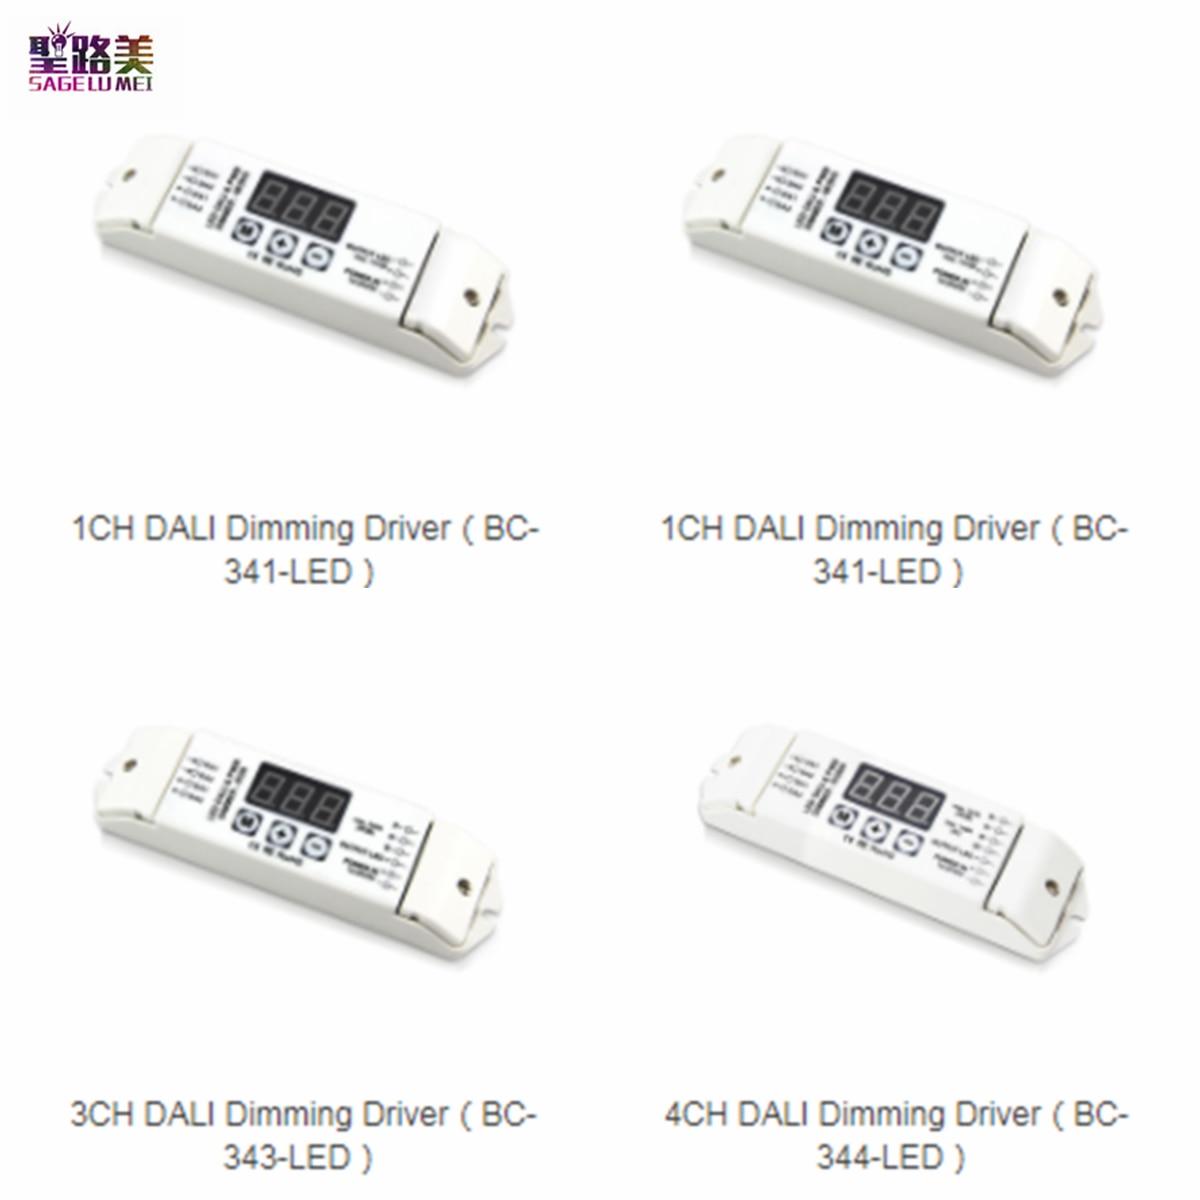 DC12V-24V دالي يعتم سائق 1CH 3CH 4CH LED وحدة تحكم لخاصية تخفيض الإضاءة ل واحد/RGB/RGBW LED قطاع أضواء مصباح